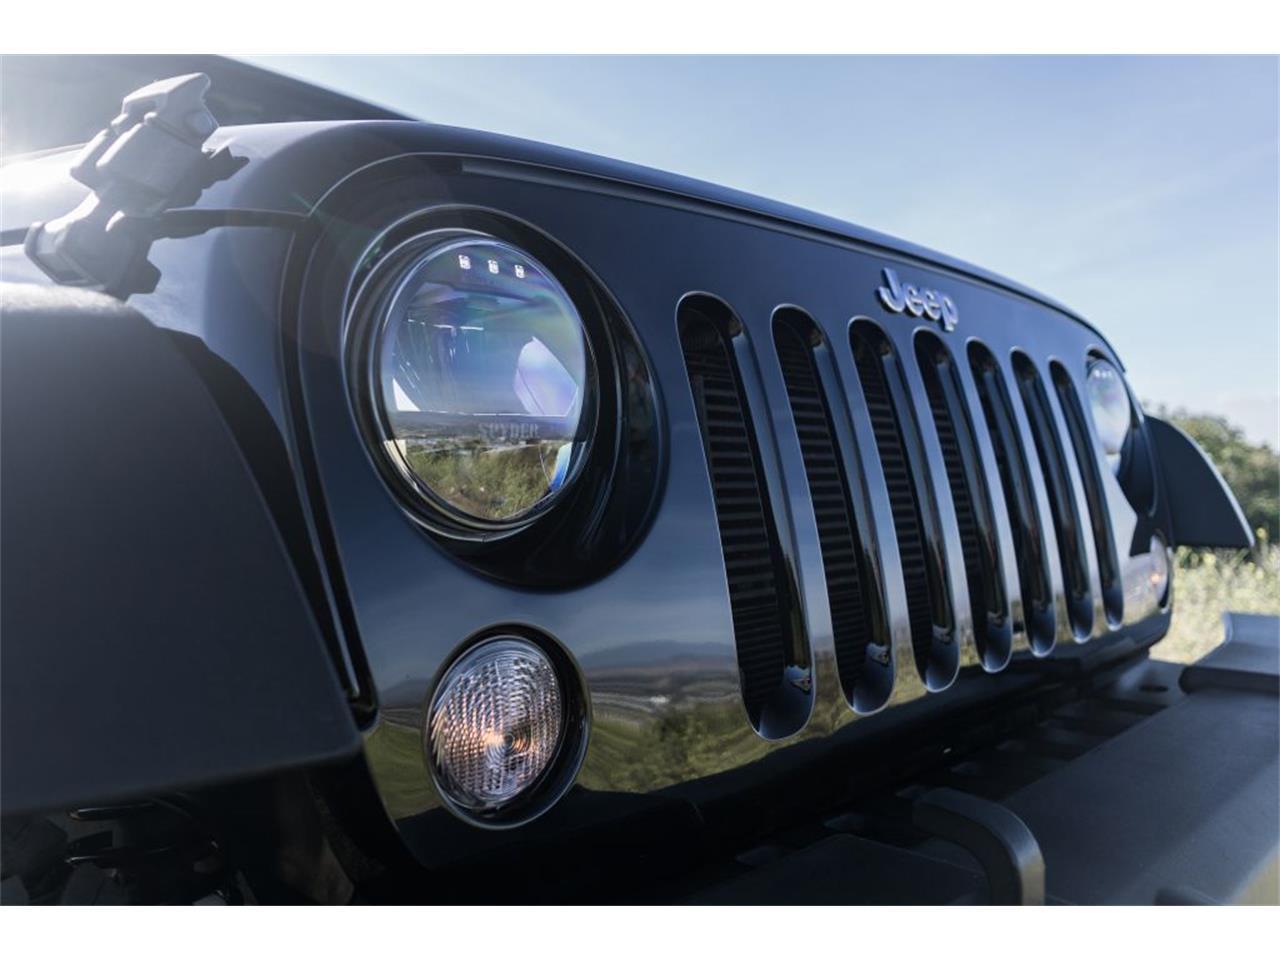 2016 Jeep Wrangler (CC-1227398) for sale in Temecula, California